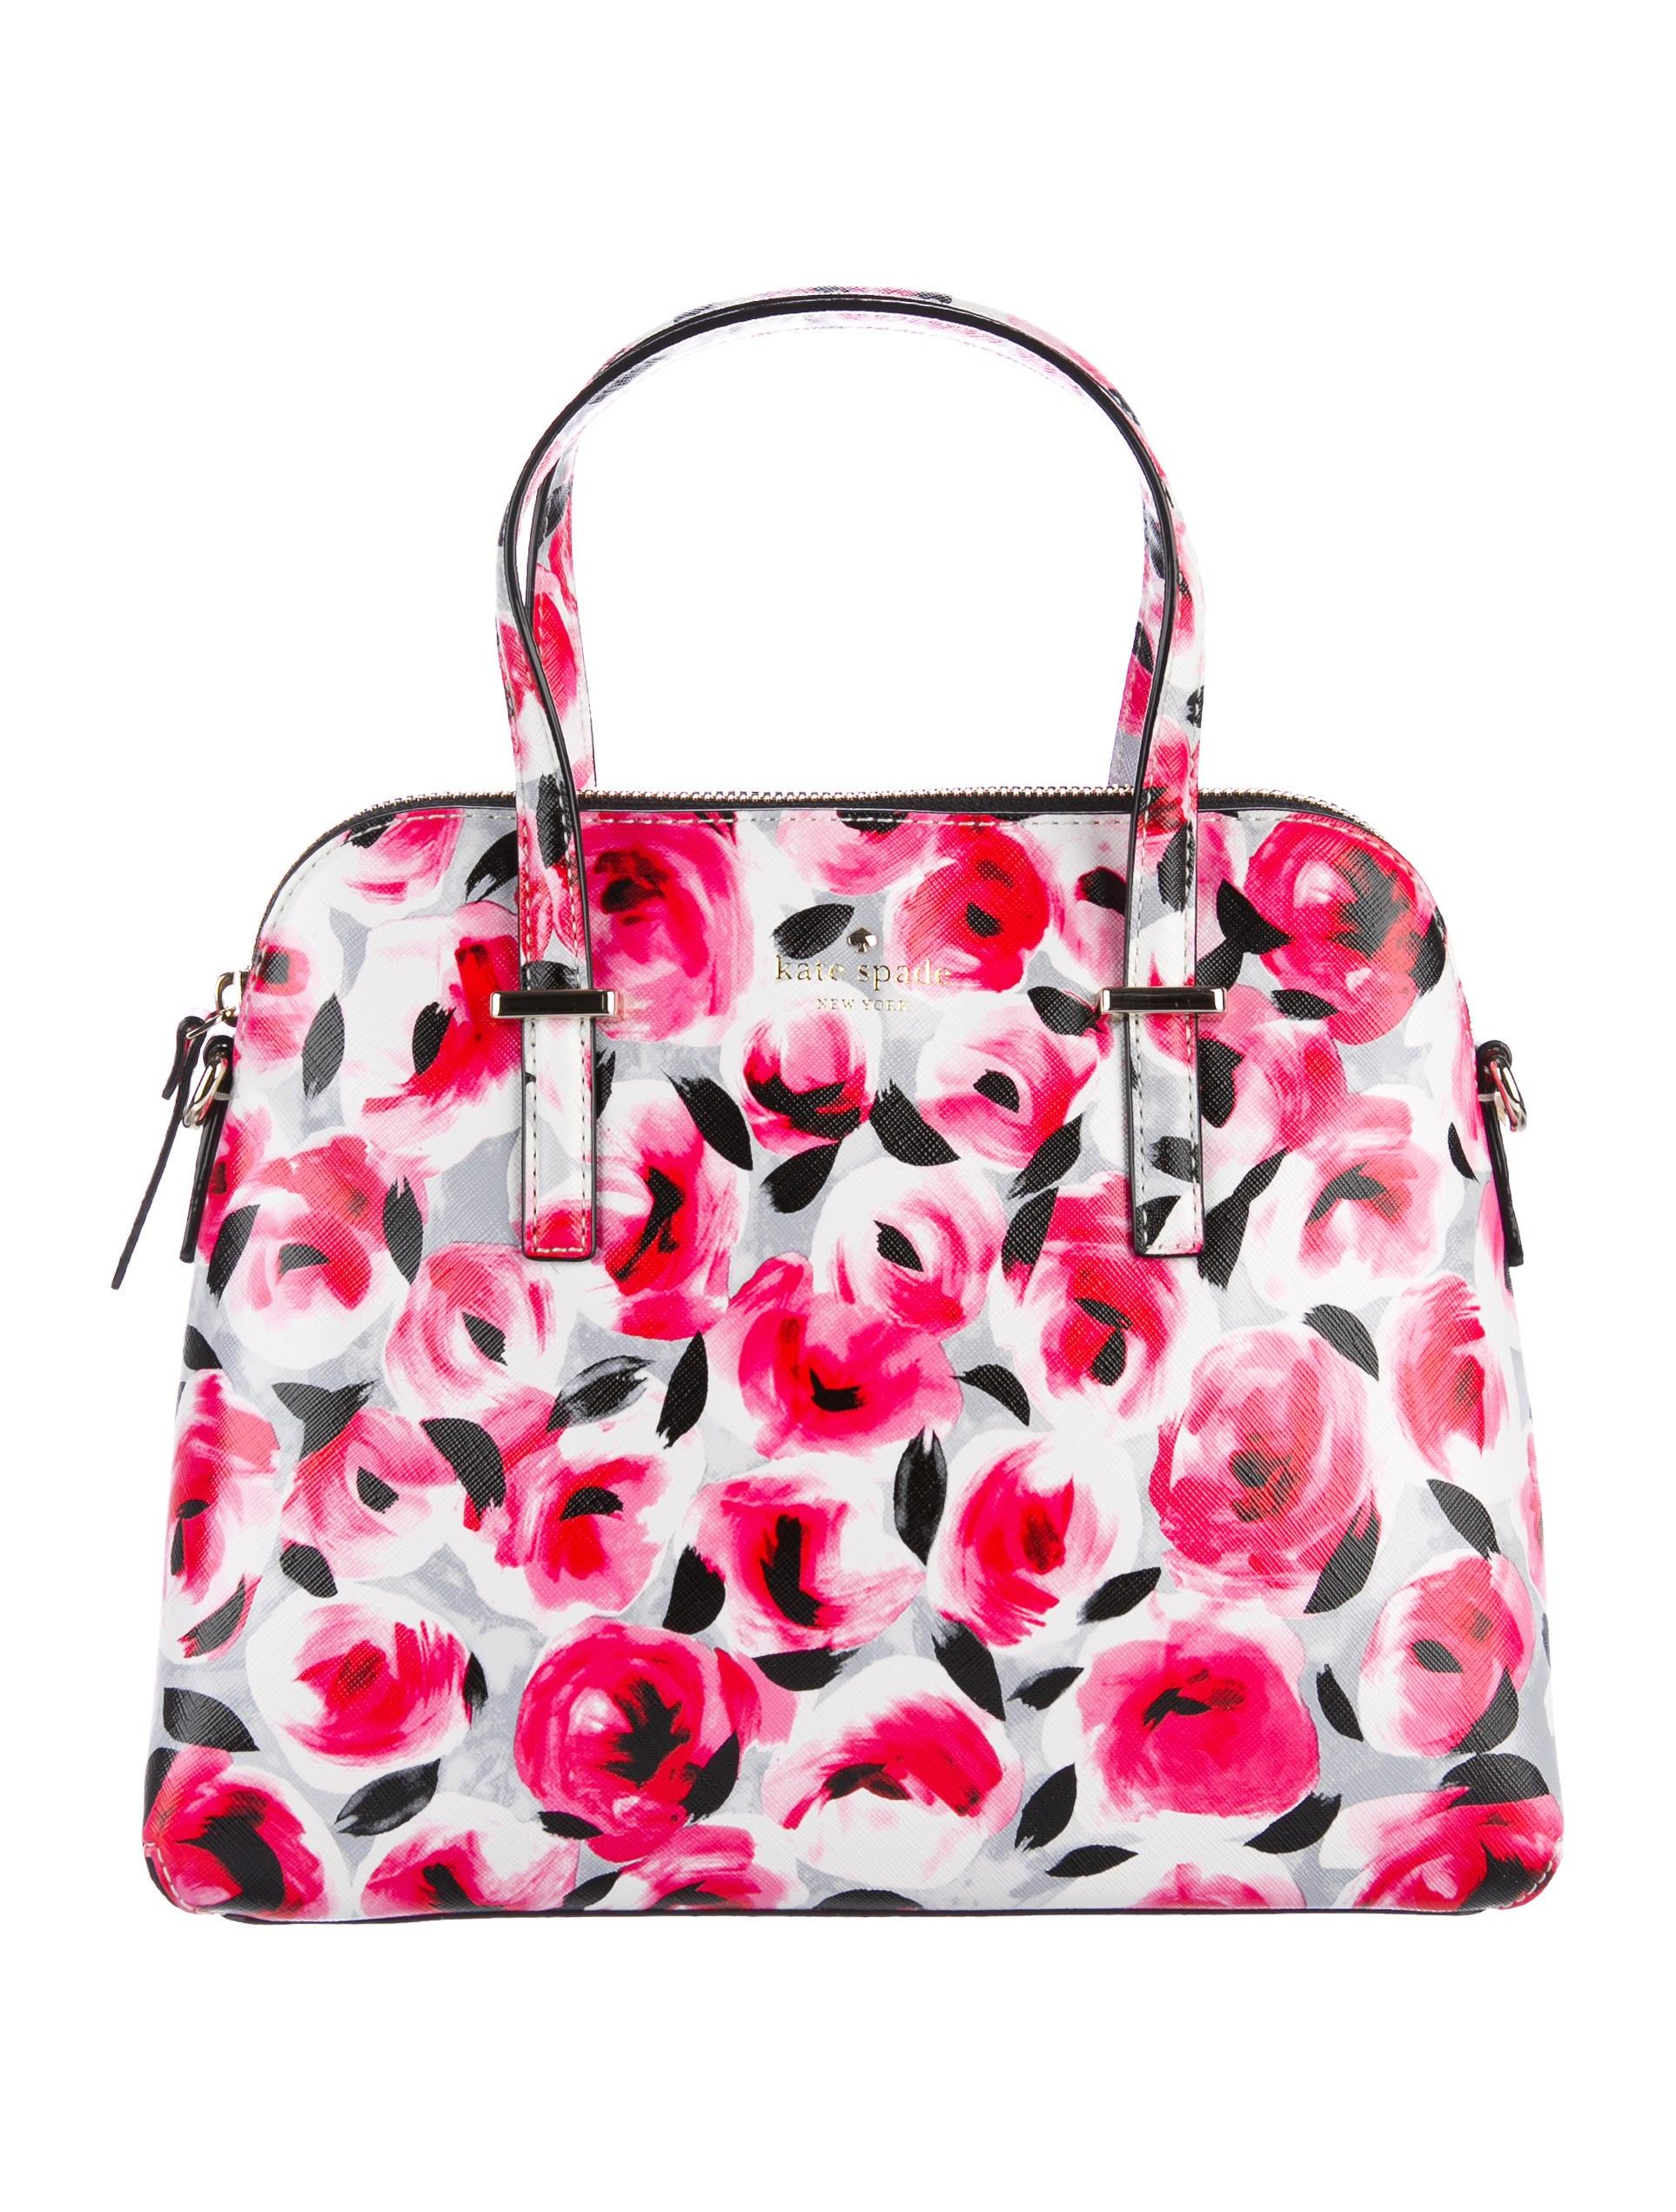 Kate Spade New York Cedar Street Rose Maise Satchel Handbags Katespade